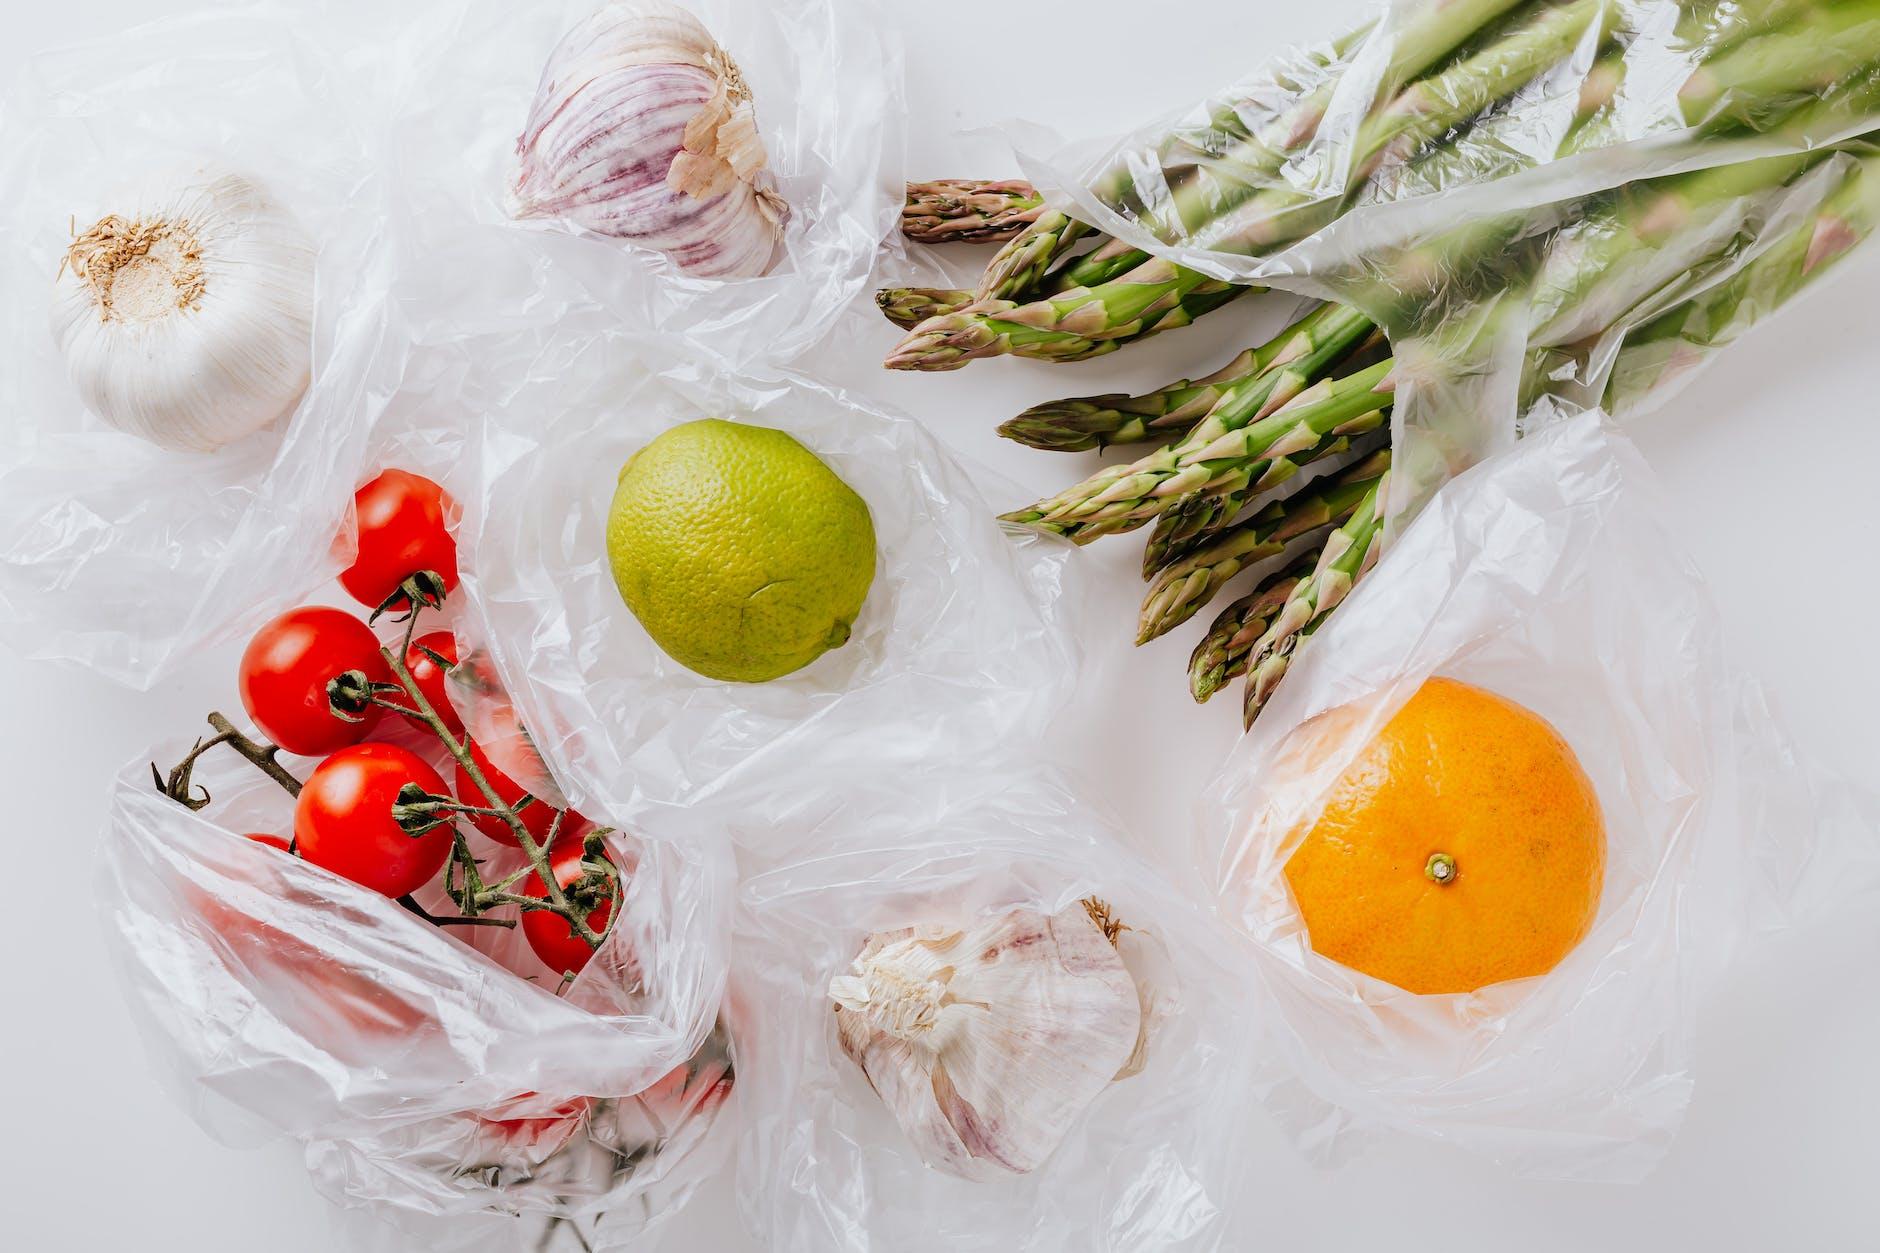 cara menyimpan sayuran tanpa kulkas gunakan plastik